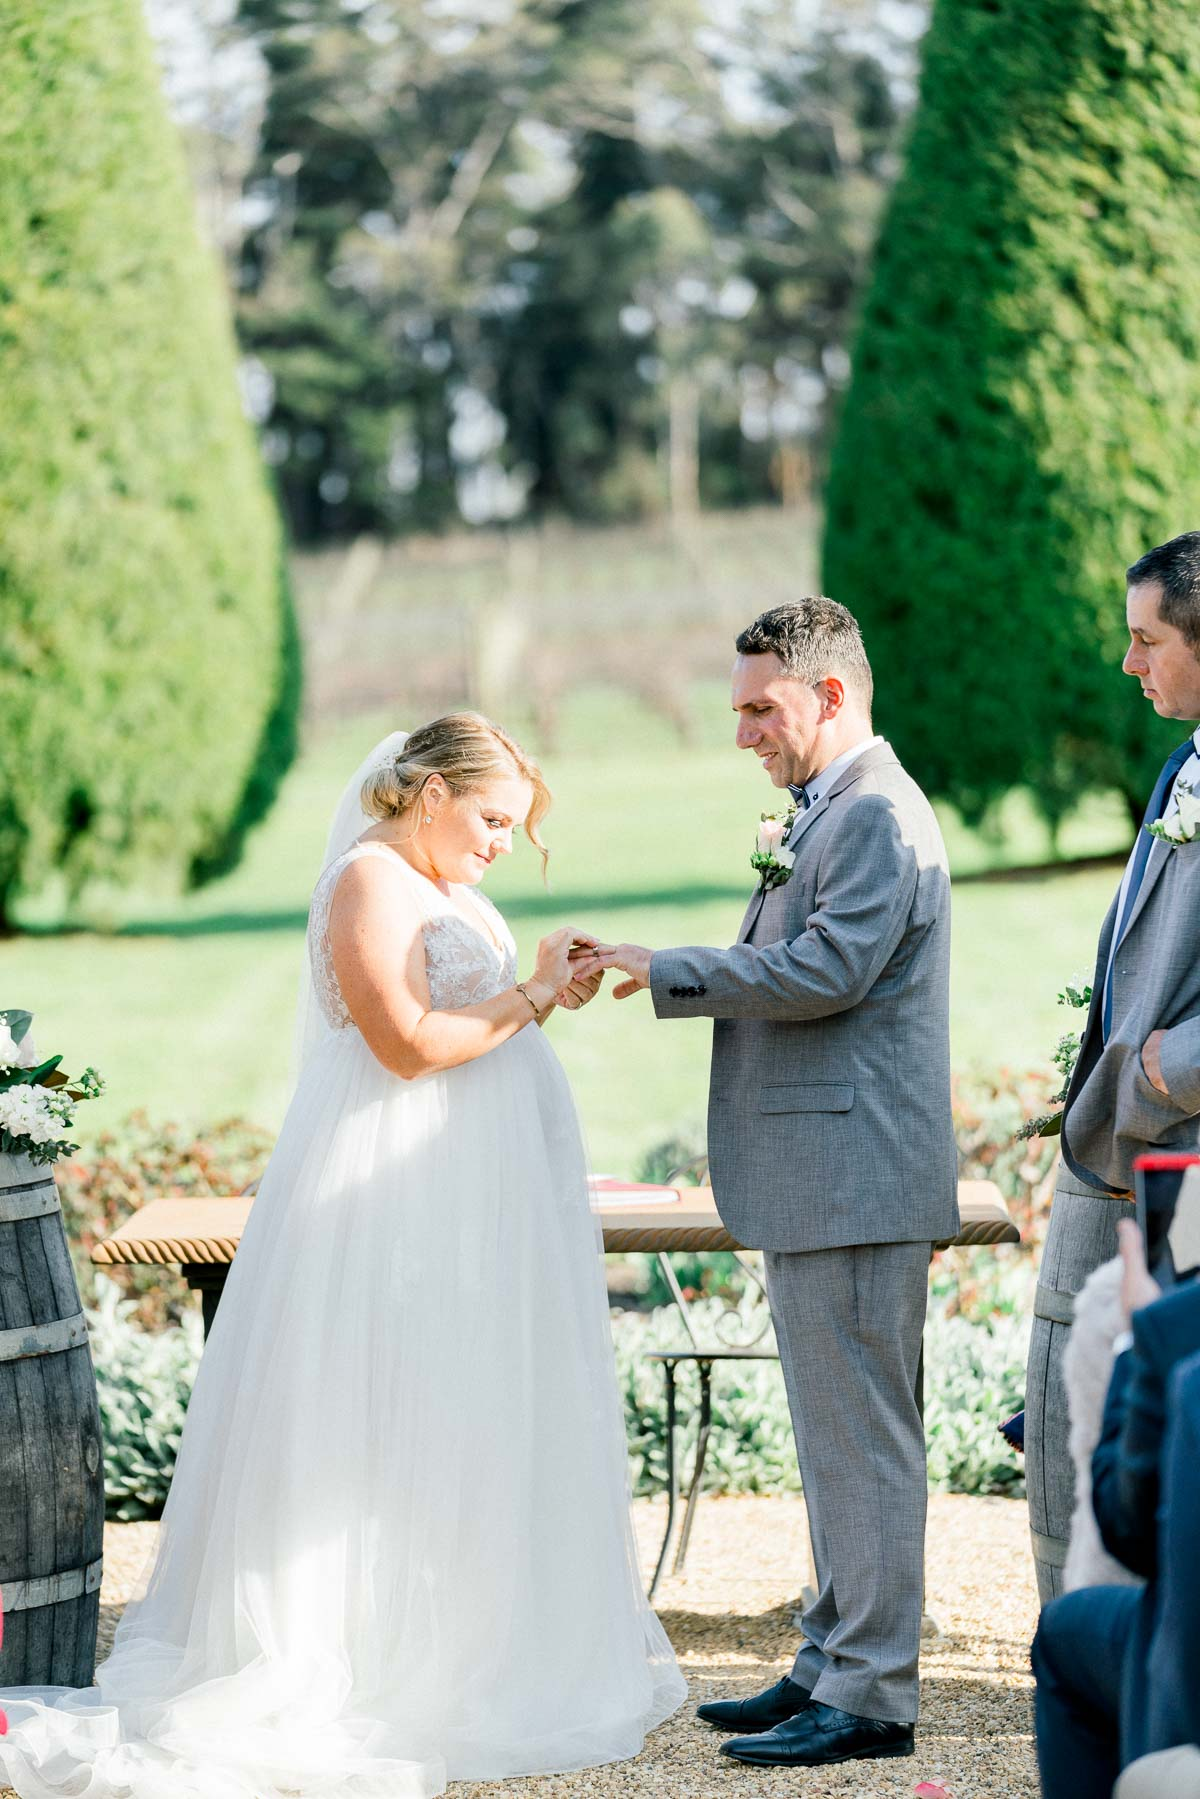 lindenderry-wedding-heart+soul-weddings-amy-alain-03347.jpg